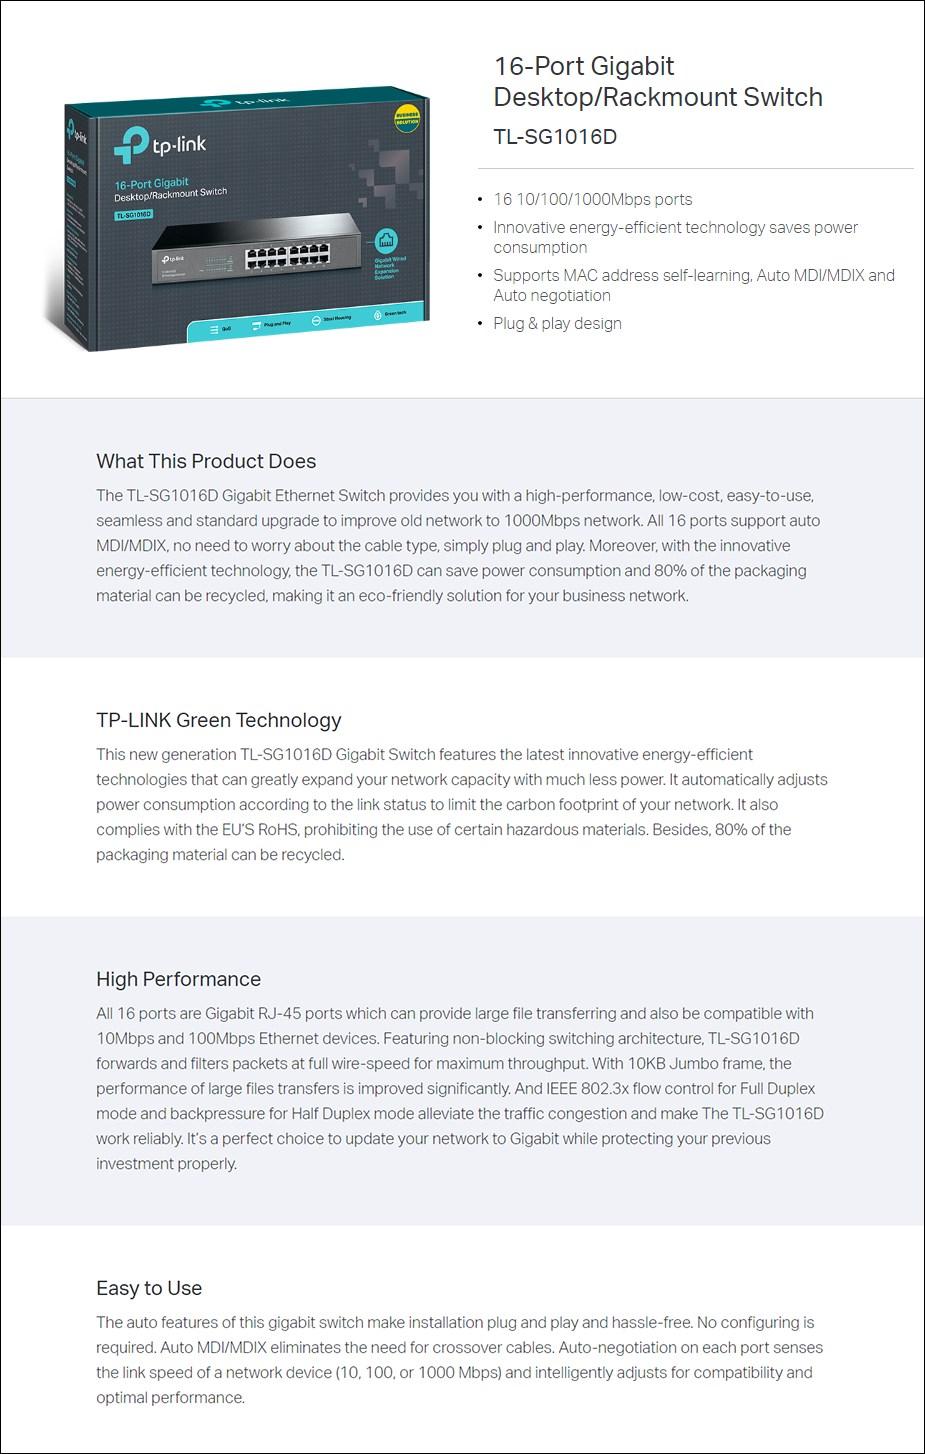 TP-Link TL-SG1016D 16-Port Gigabit Desktop / Rackmount Switch - Metal Housing - Overview 1